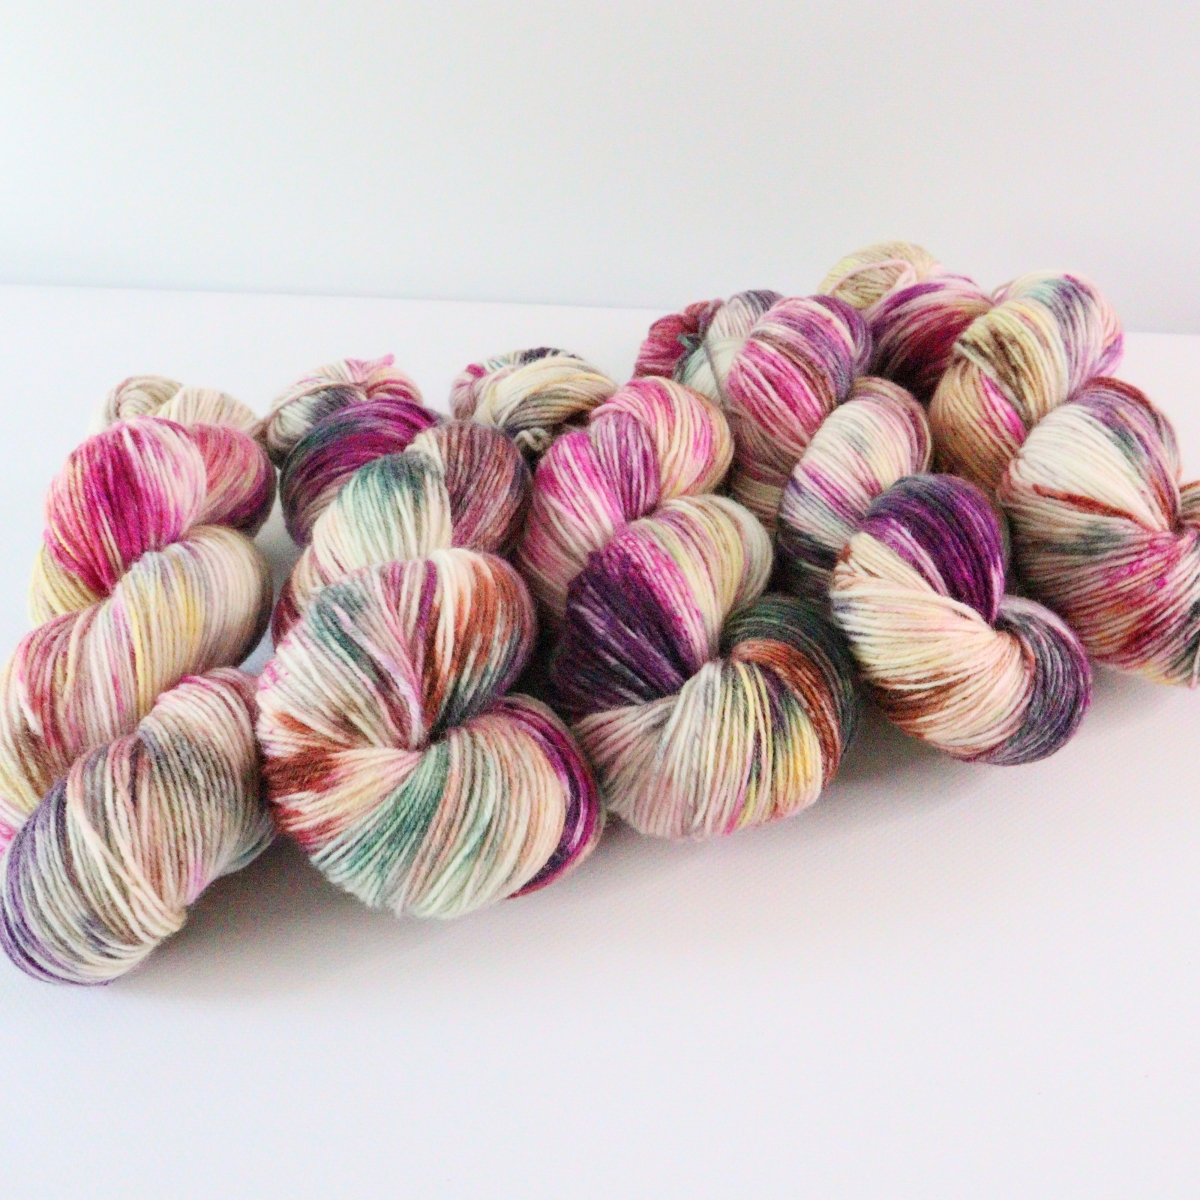 woodico.pro hand dyed yarn 070 5 1200x1200 - Hand dyed yarn / 070